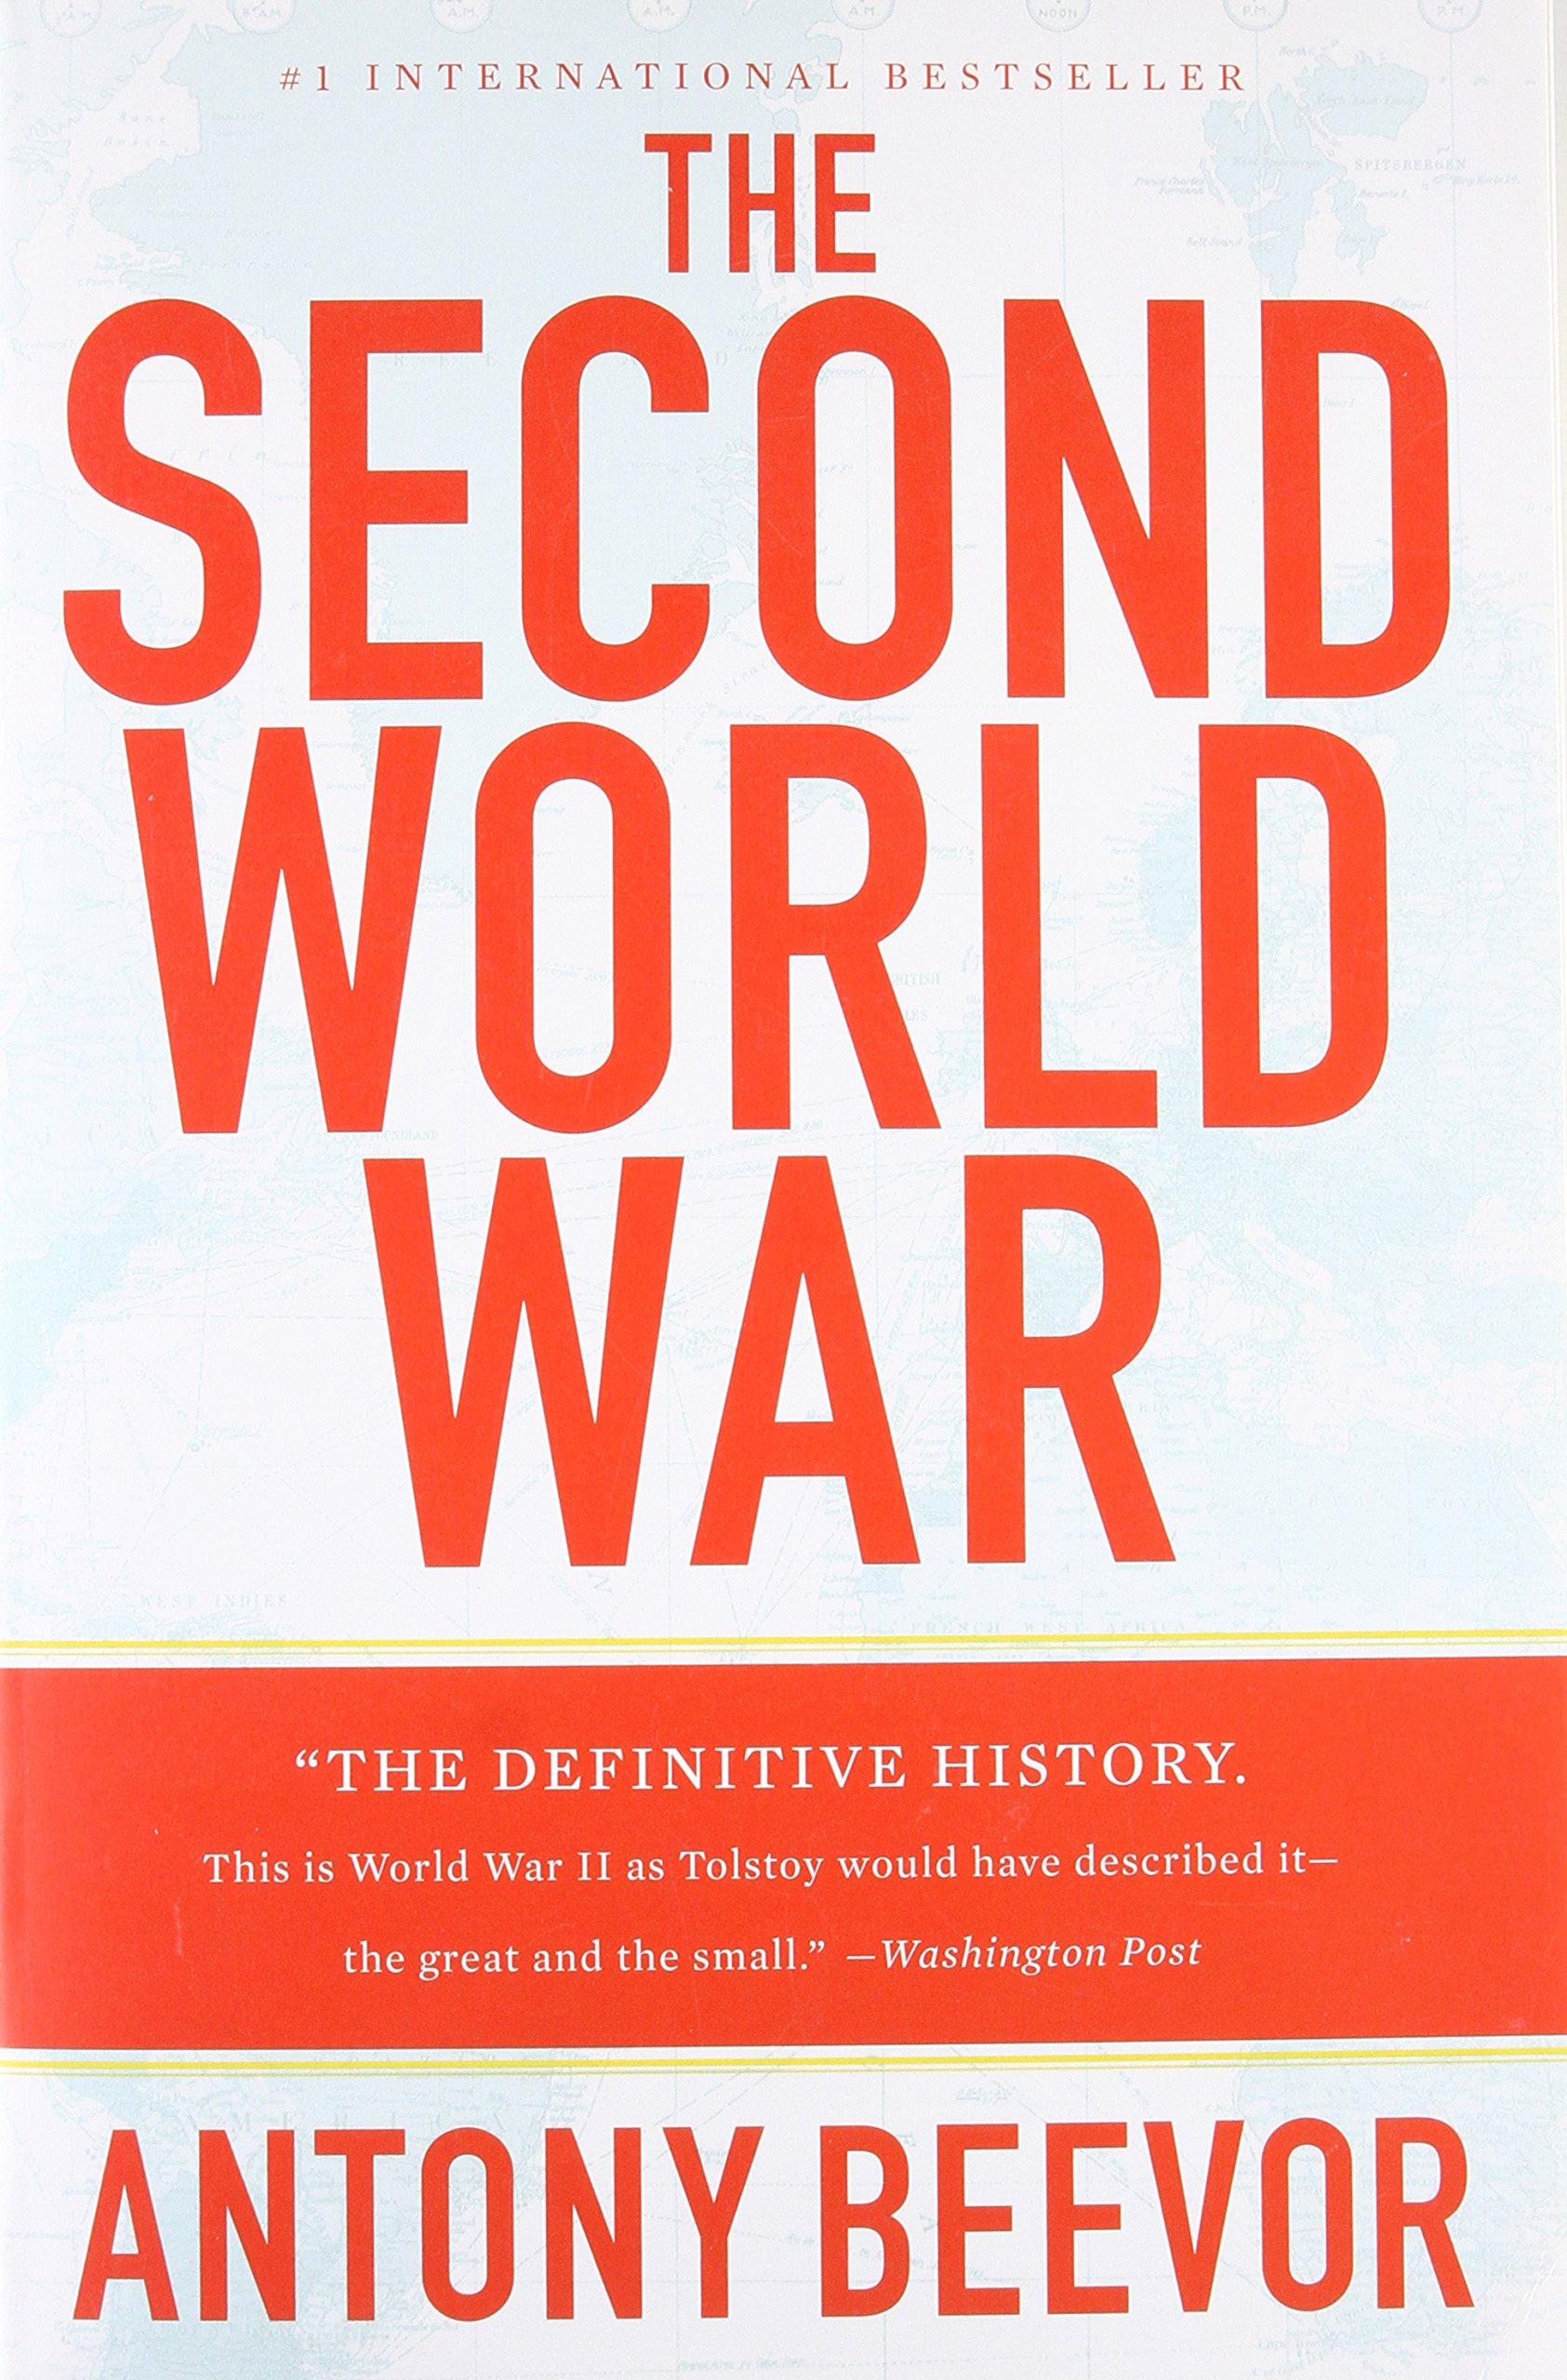 The second world war antony beevor 9780316023757 amazon books fandeluxe Image collections